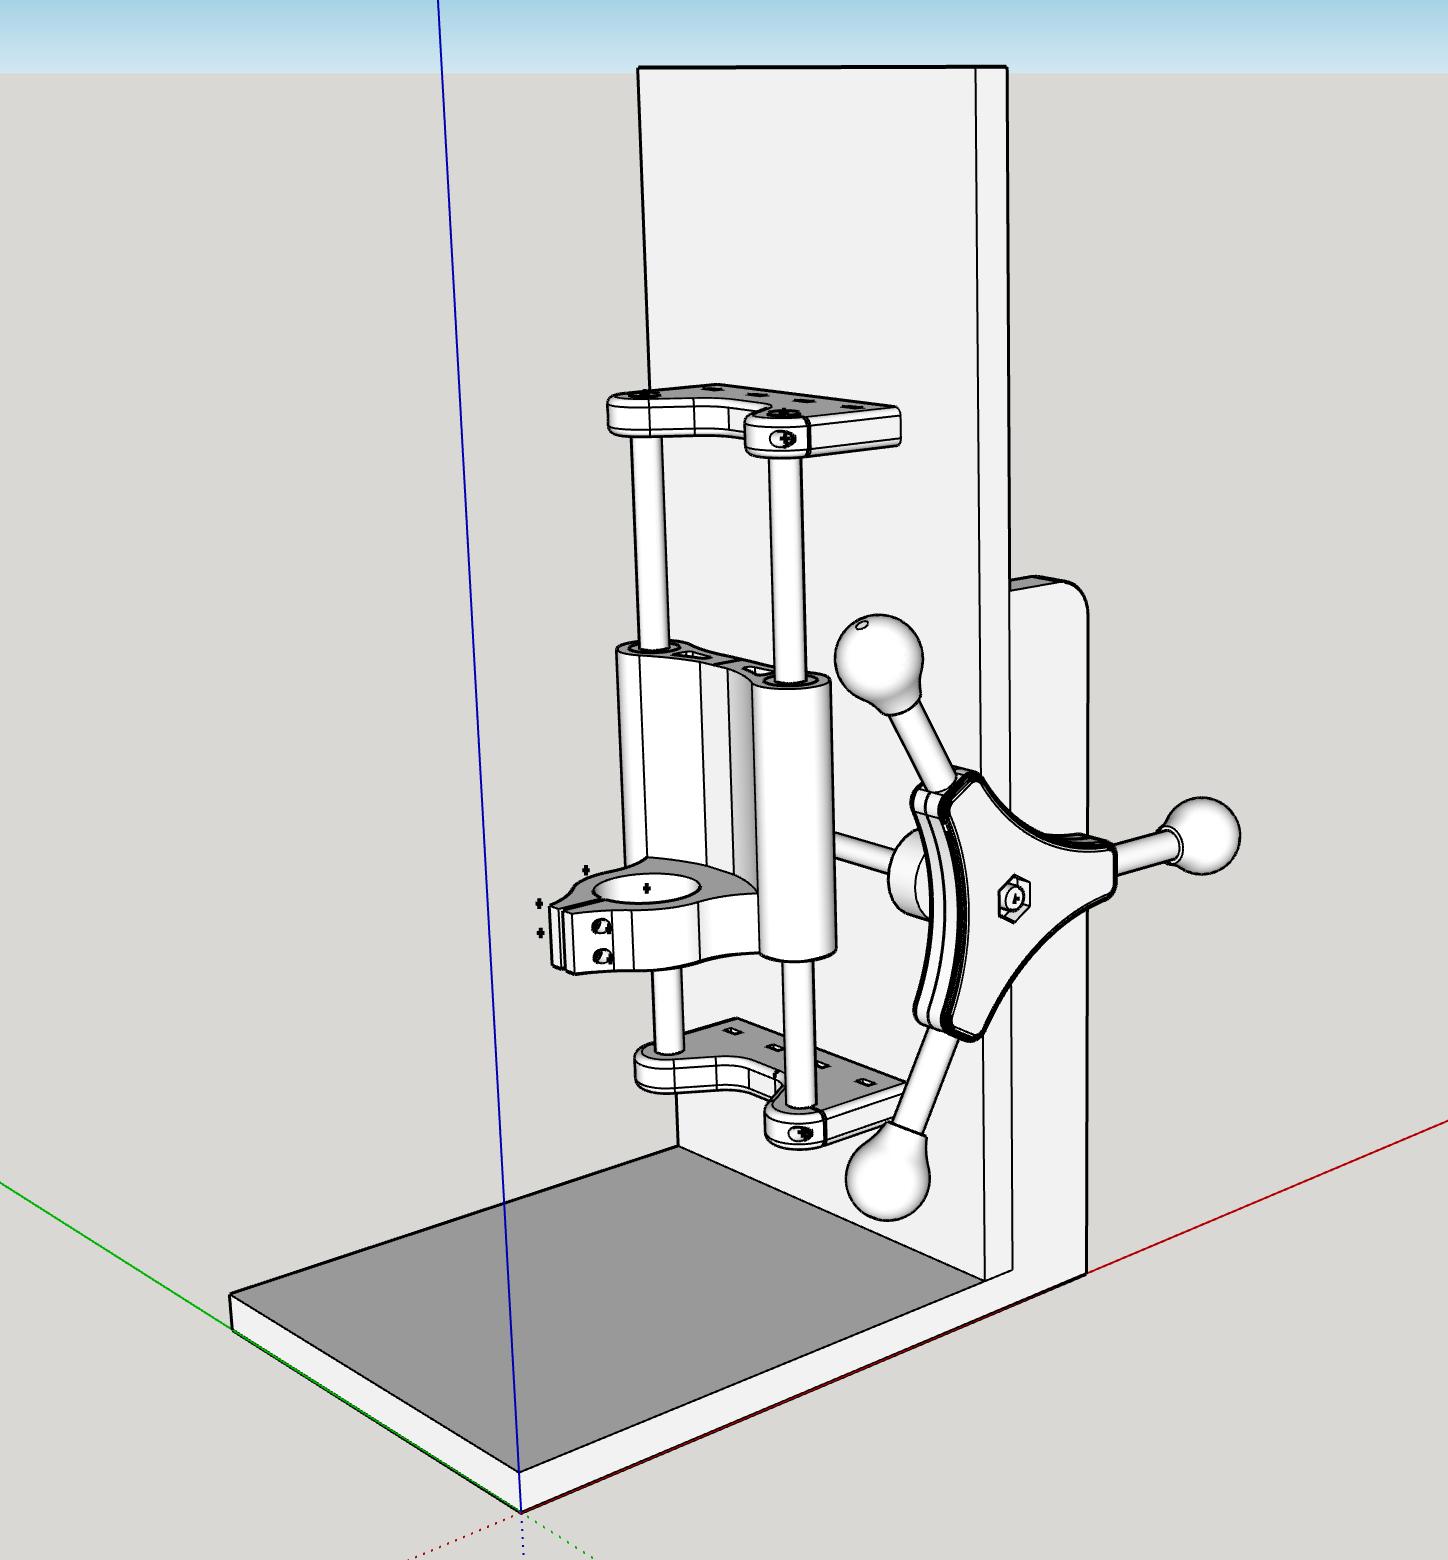 PRESSDRIL_2.png Download free STL file COLUMN DRILL • Design to 3D print, Pipapelaa